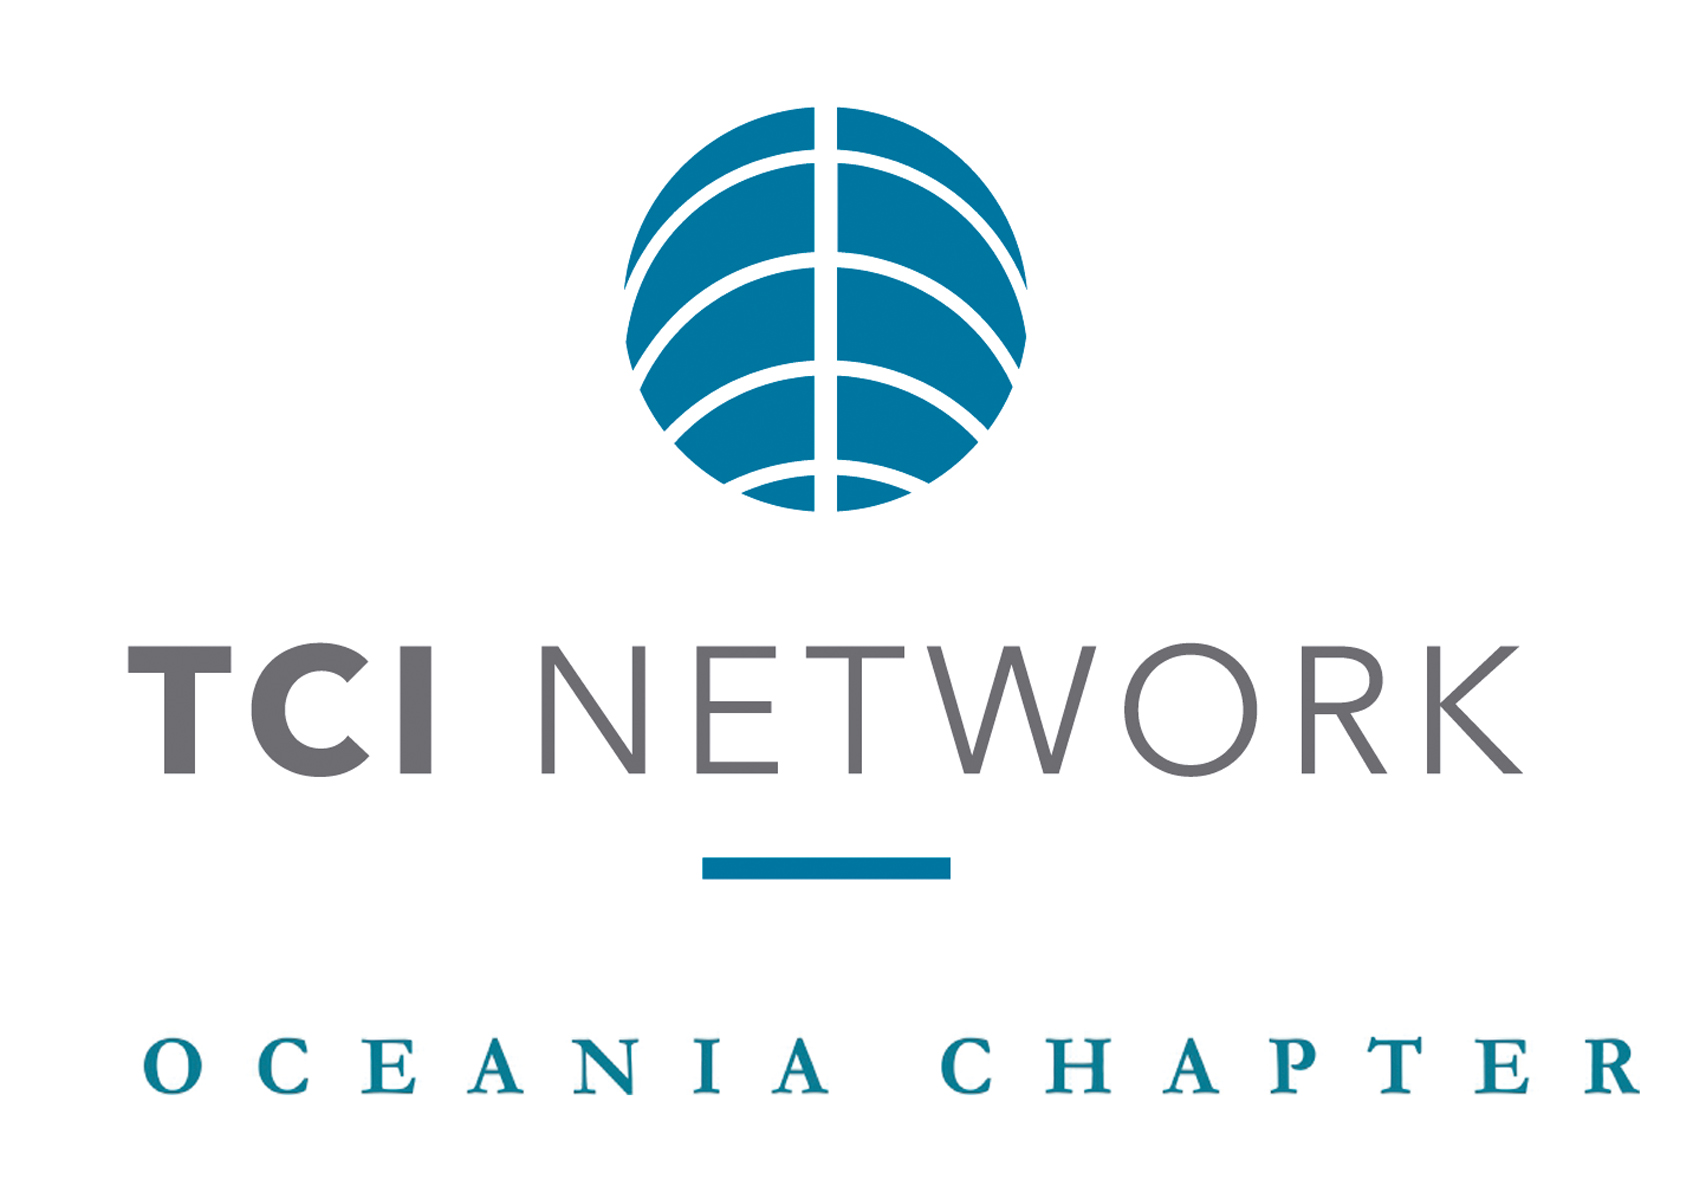 TCI-Oceania-Chapter-Logo-RGB-3